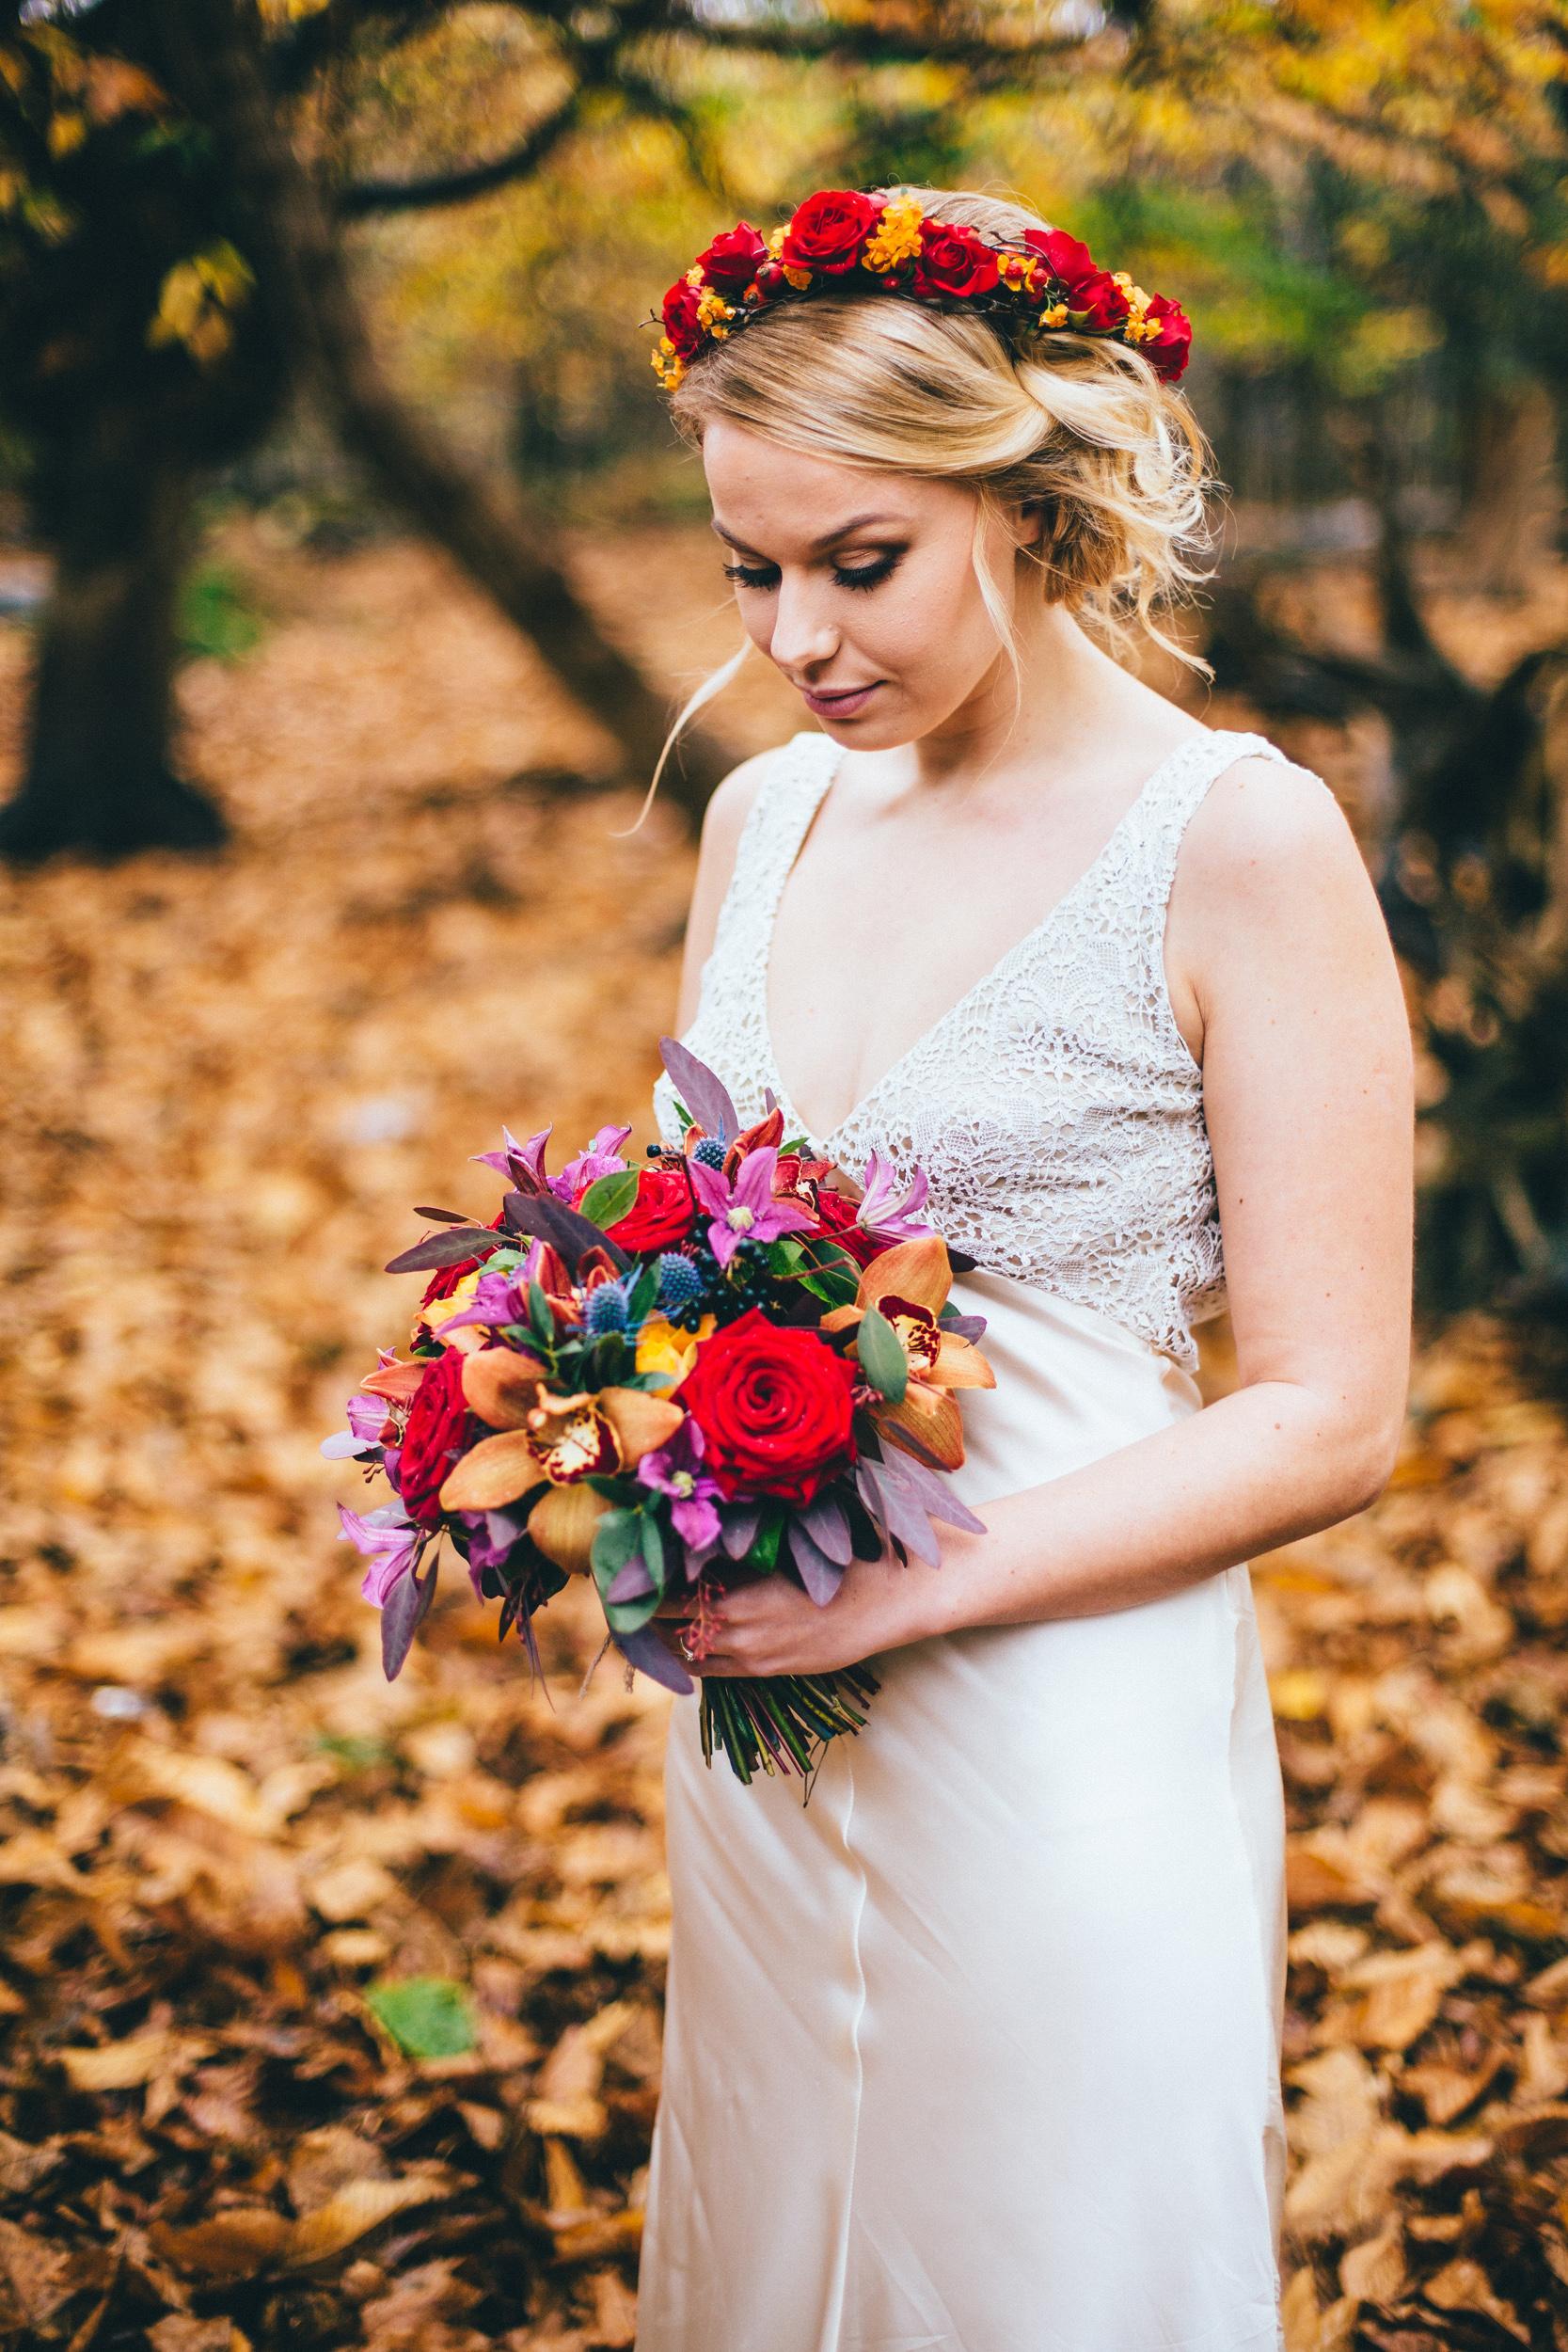 Kate-Beaumont-Wedding-Dresses-Autumn-Shoot-Rebecca-Tovey-1.jpg